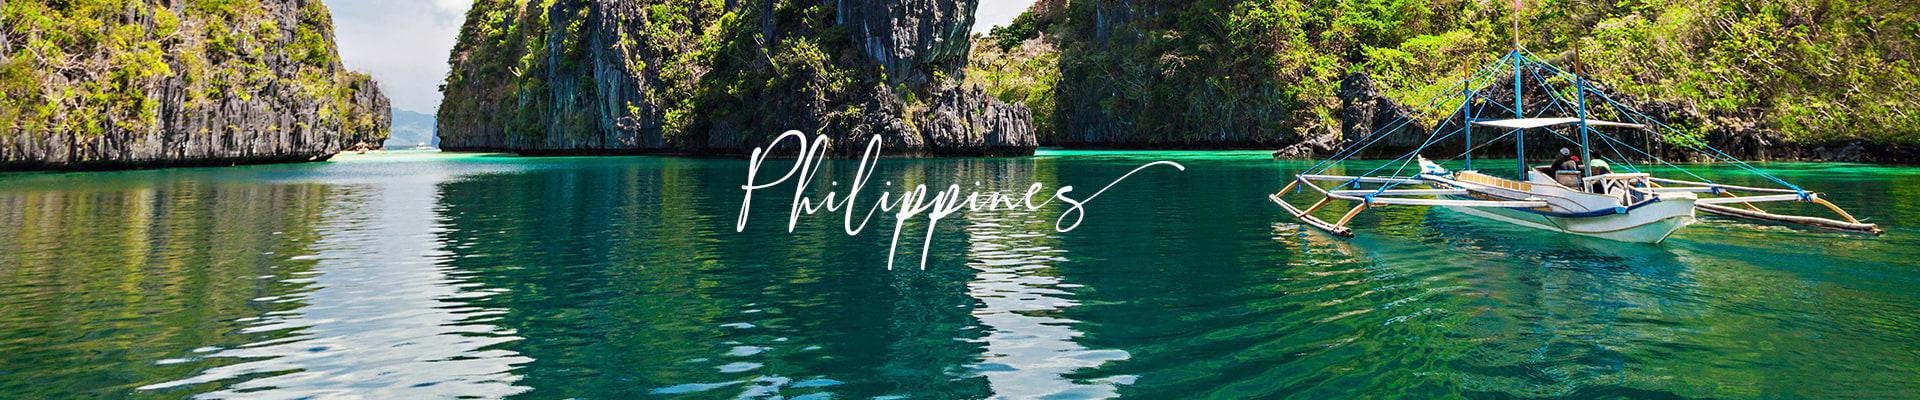 images/panos/desktop/philippines